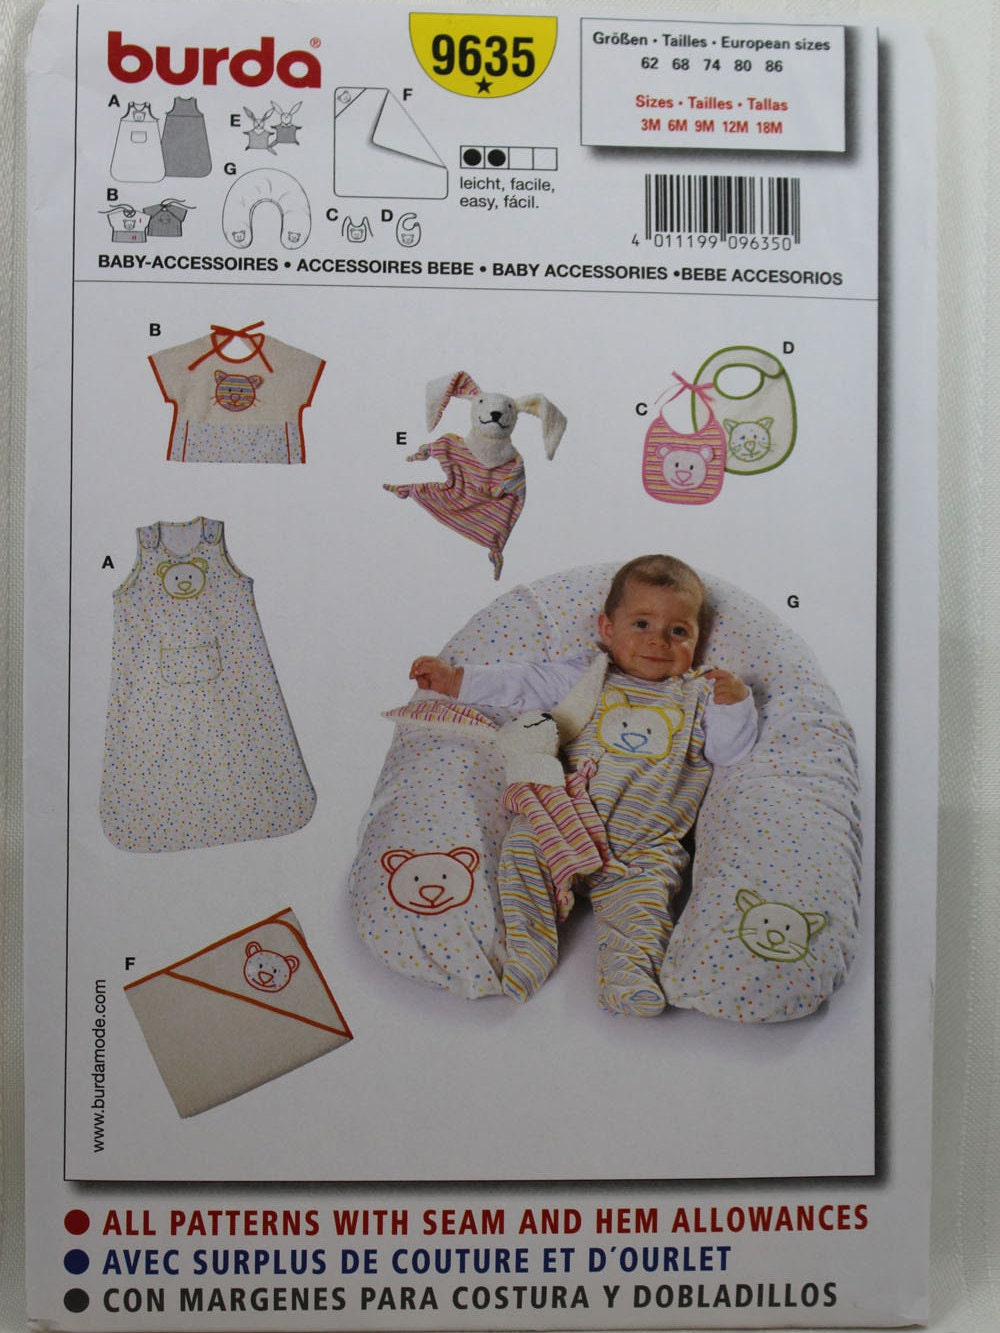 Burda 9635 Baby Accessoires Nähen Muster, Sack Bad Handtuch ...